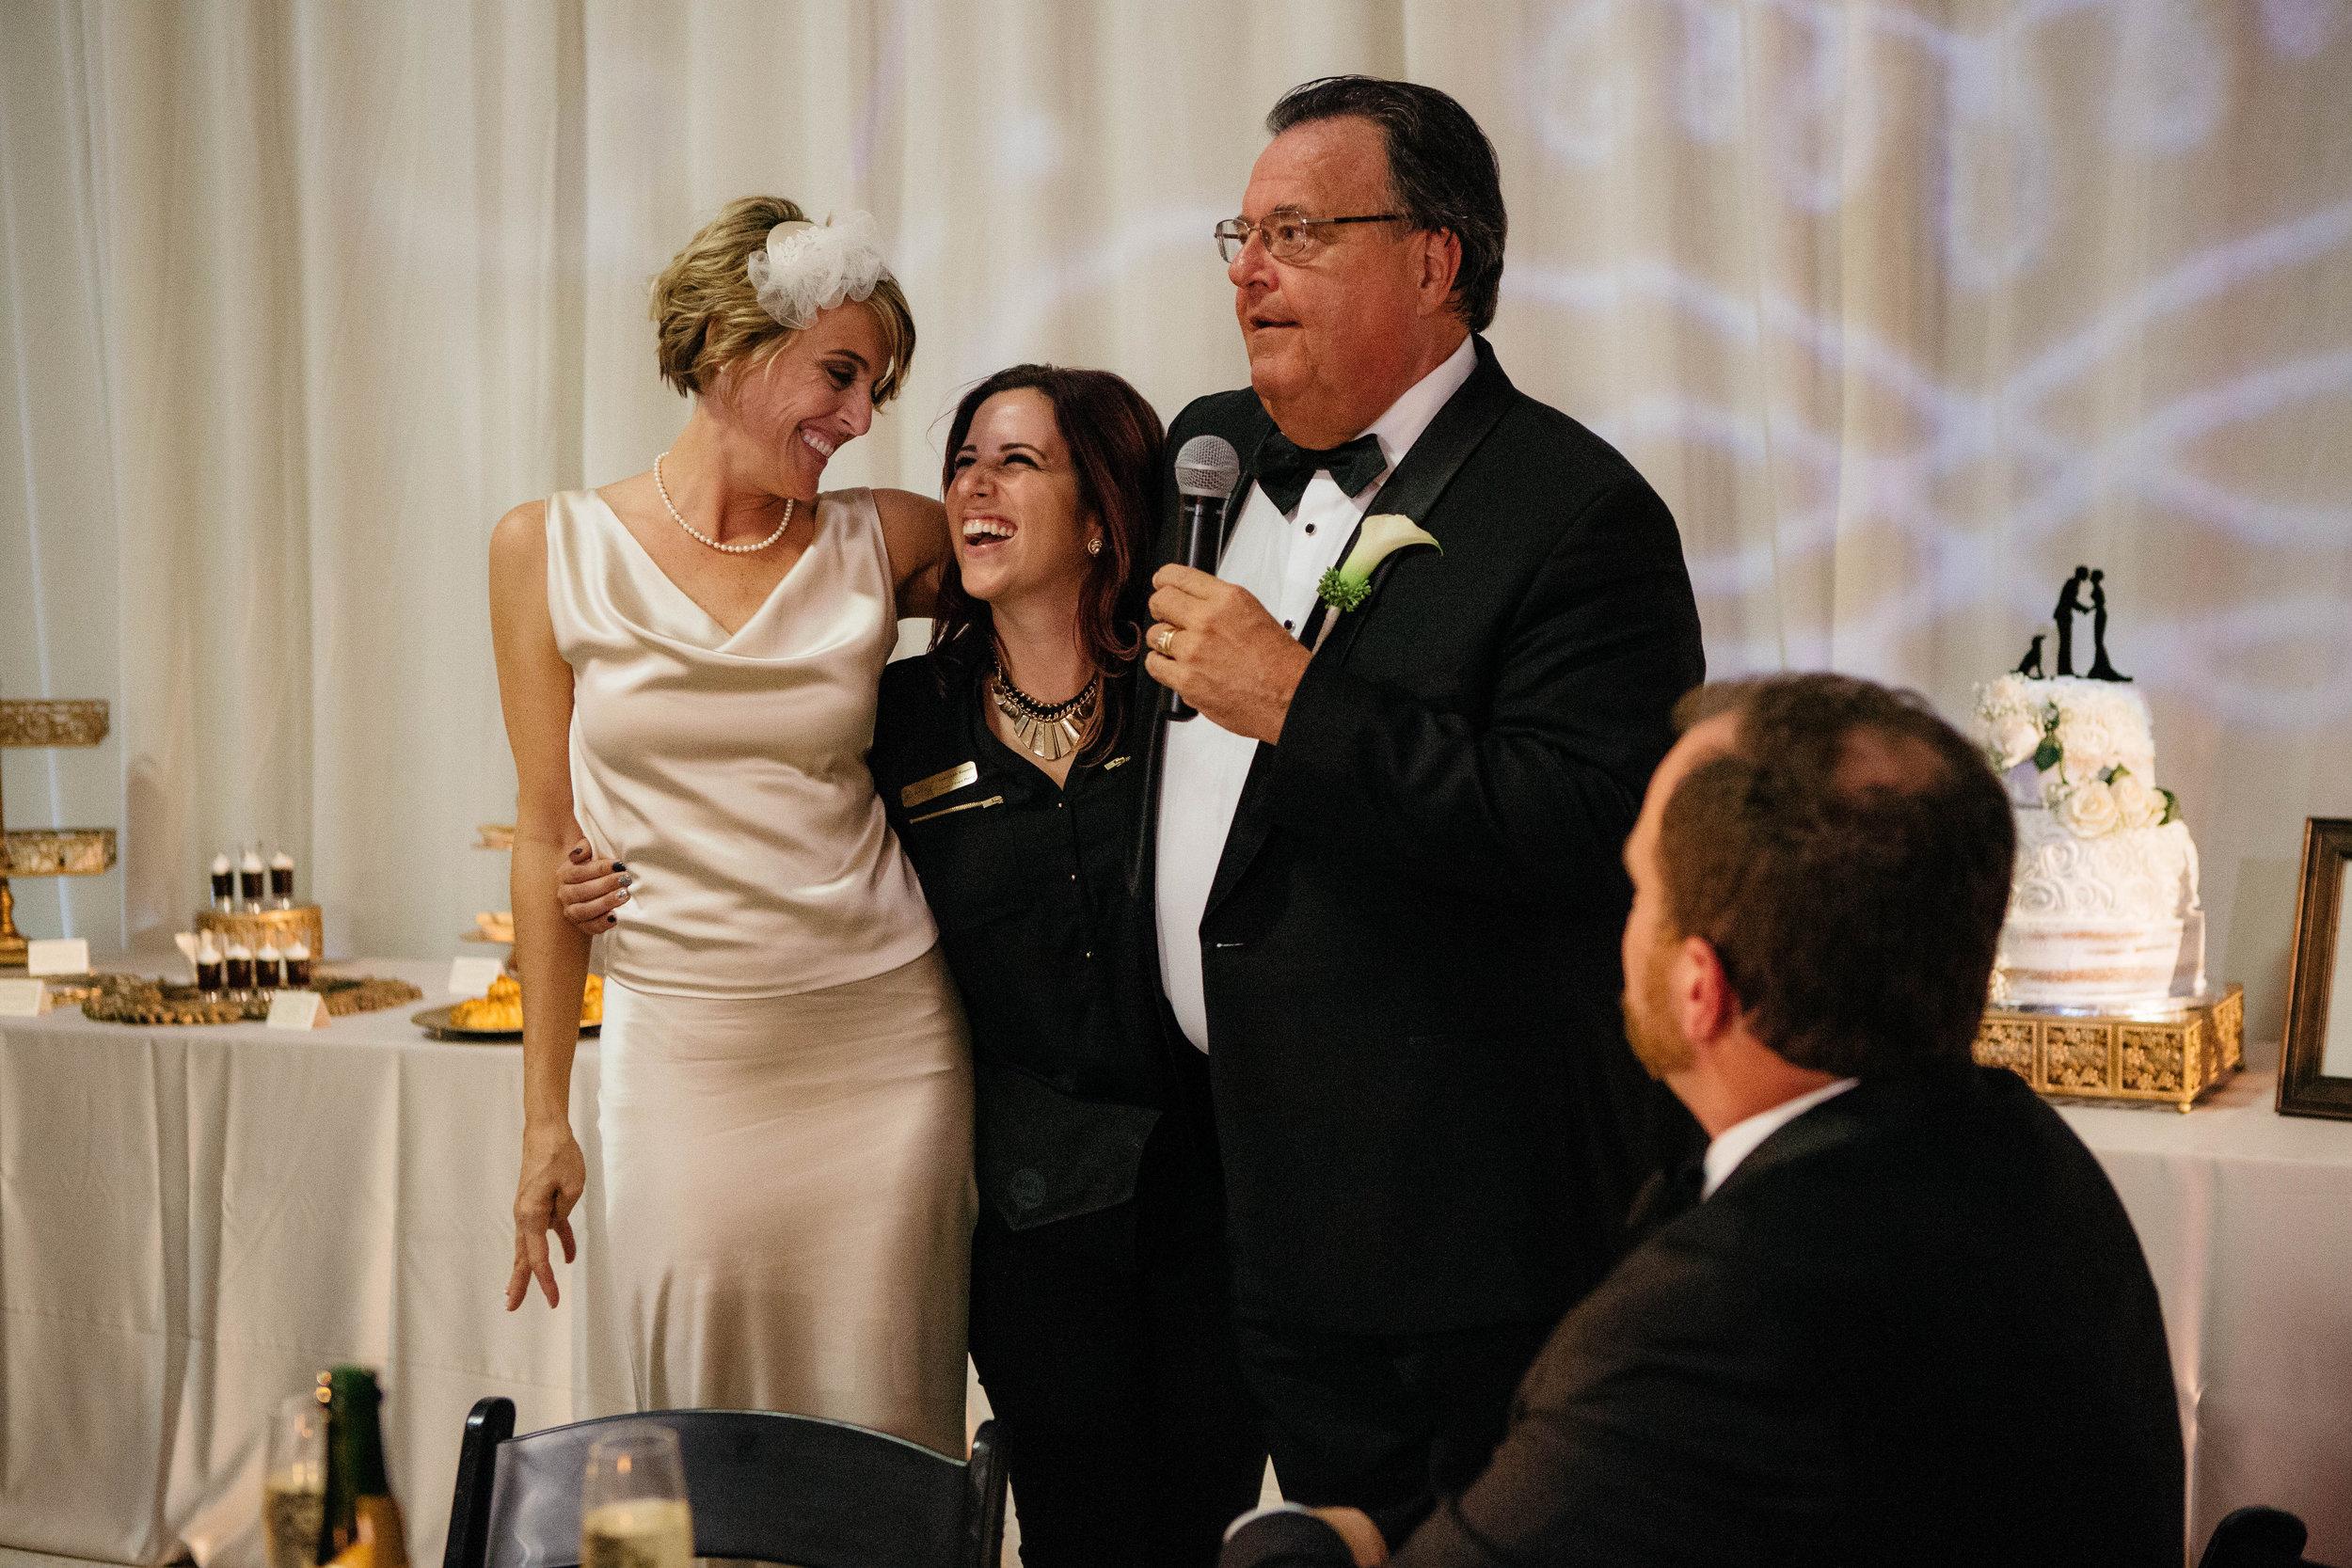 Aaron and joelie s Wedding Day-Reception-0037.jpg